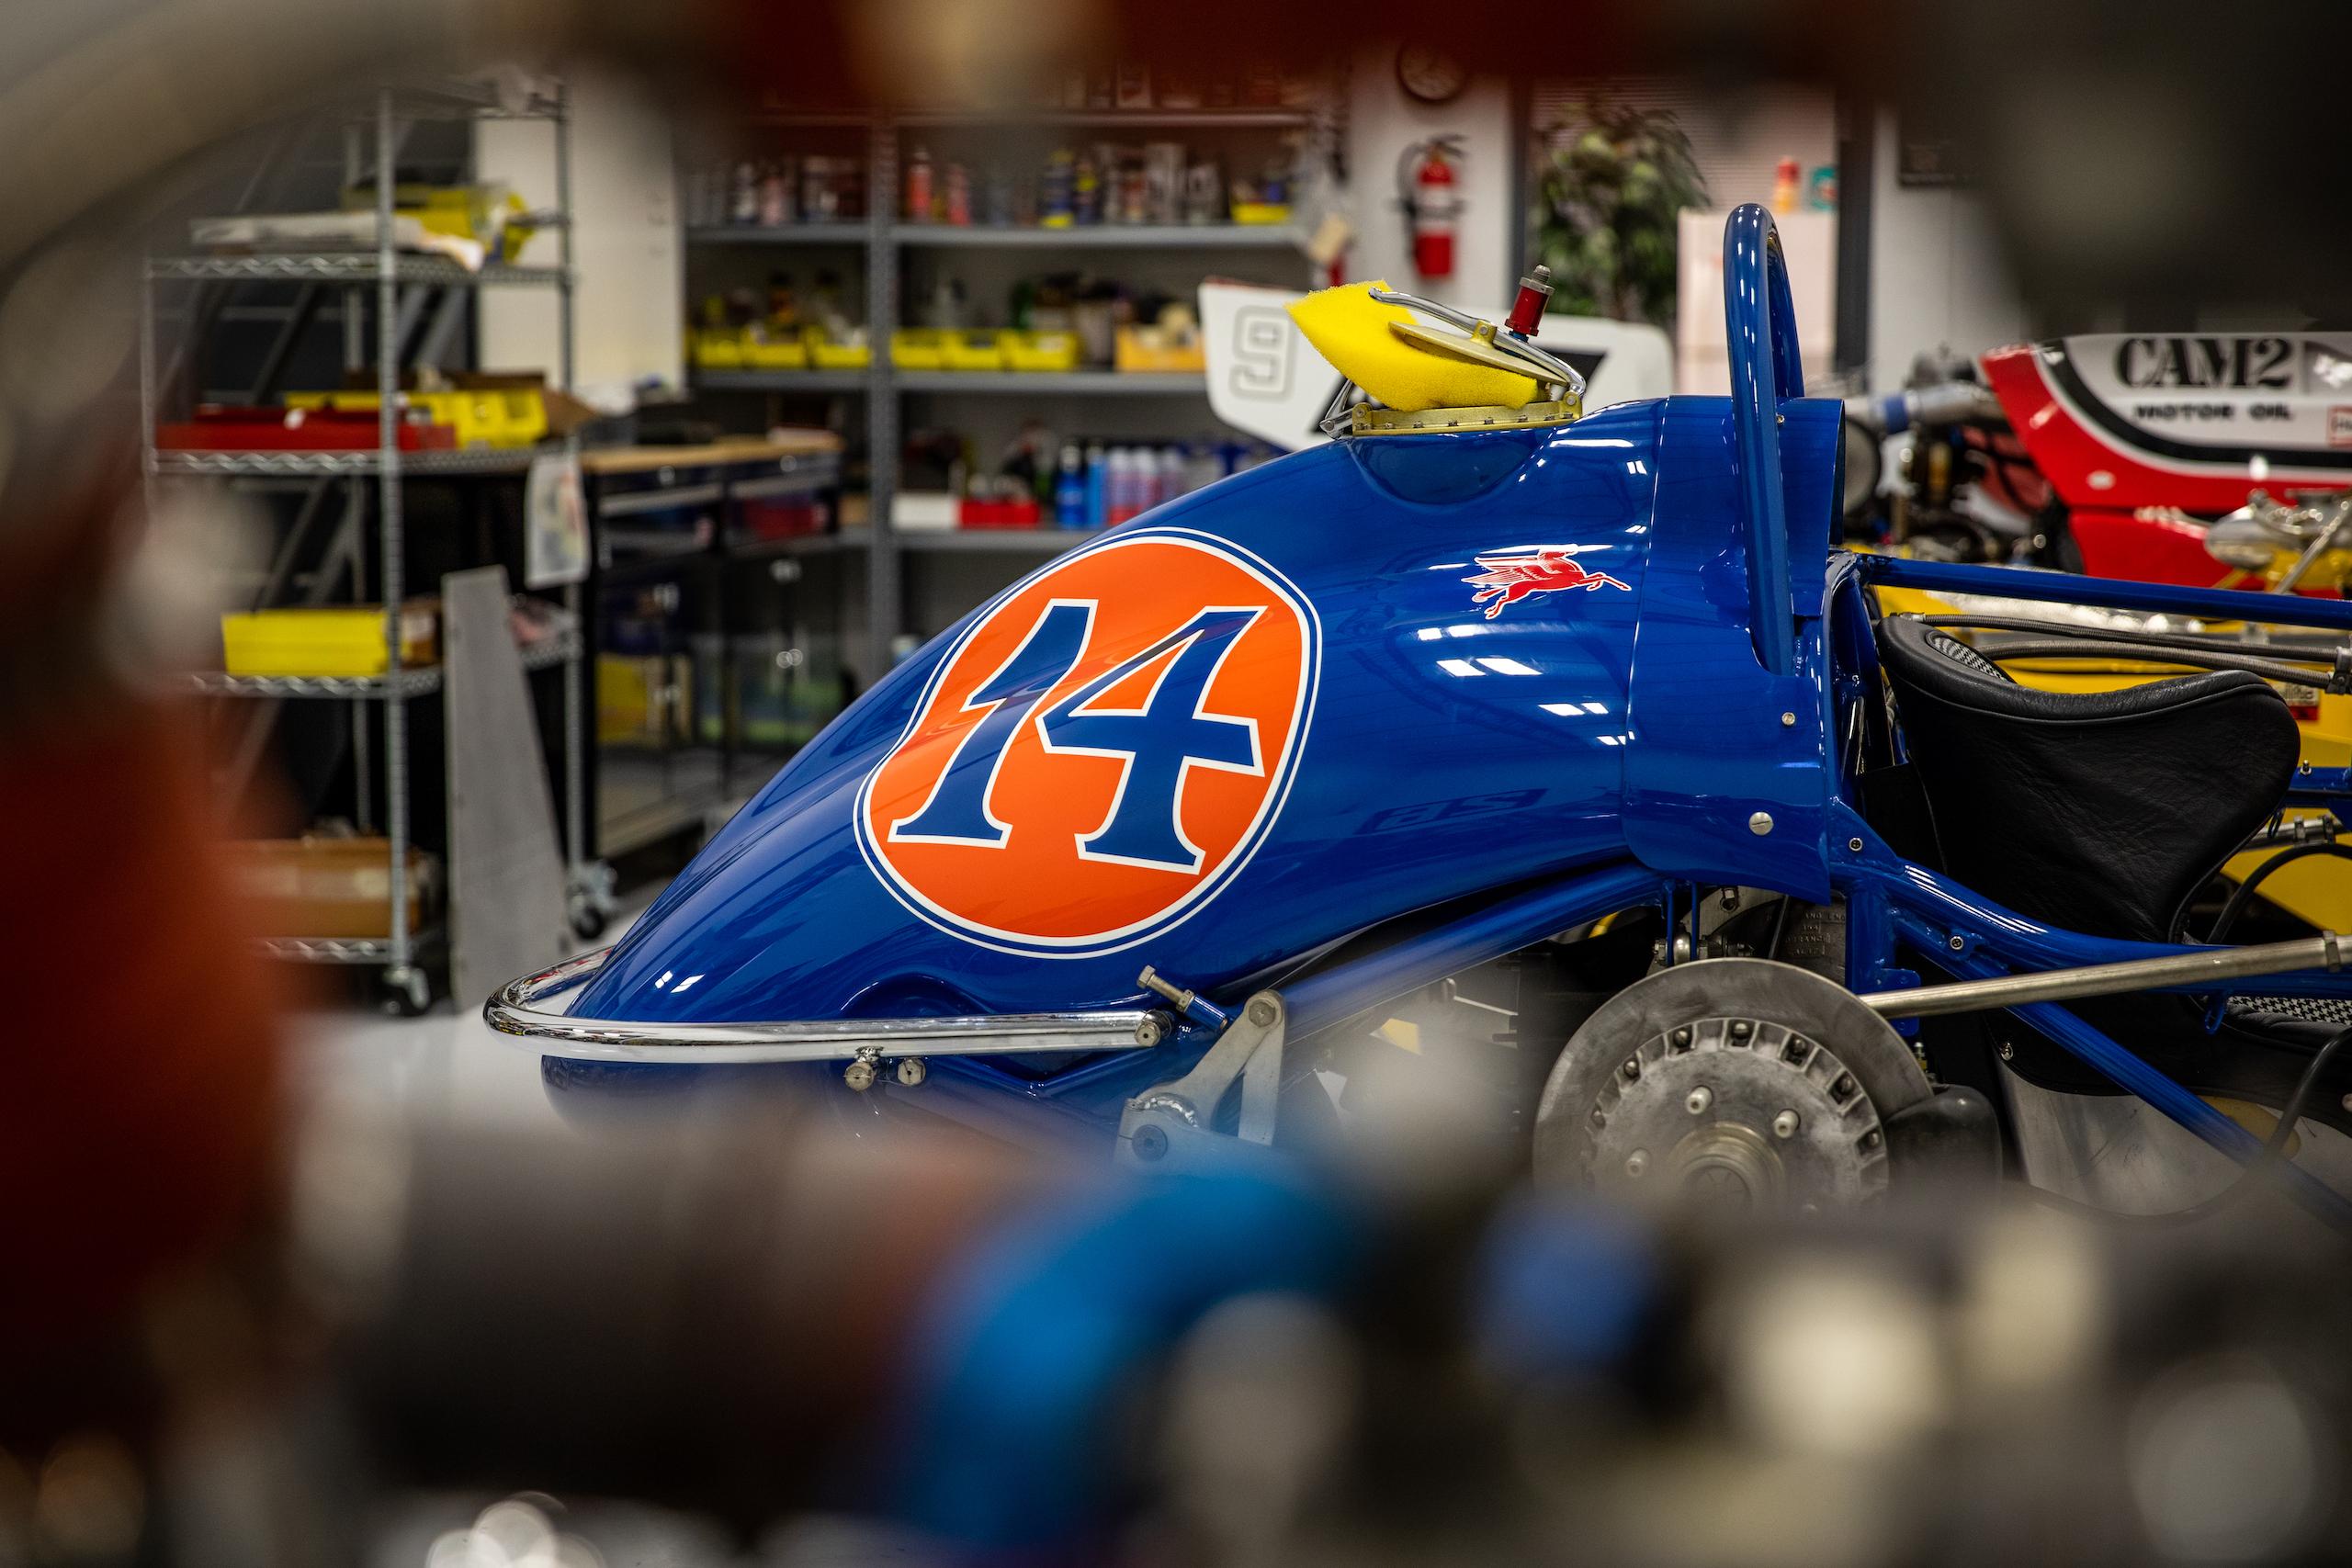 Turn 4 Restorations blue racer